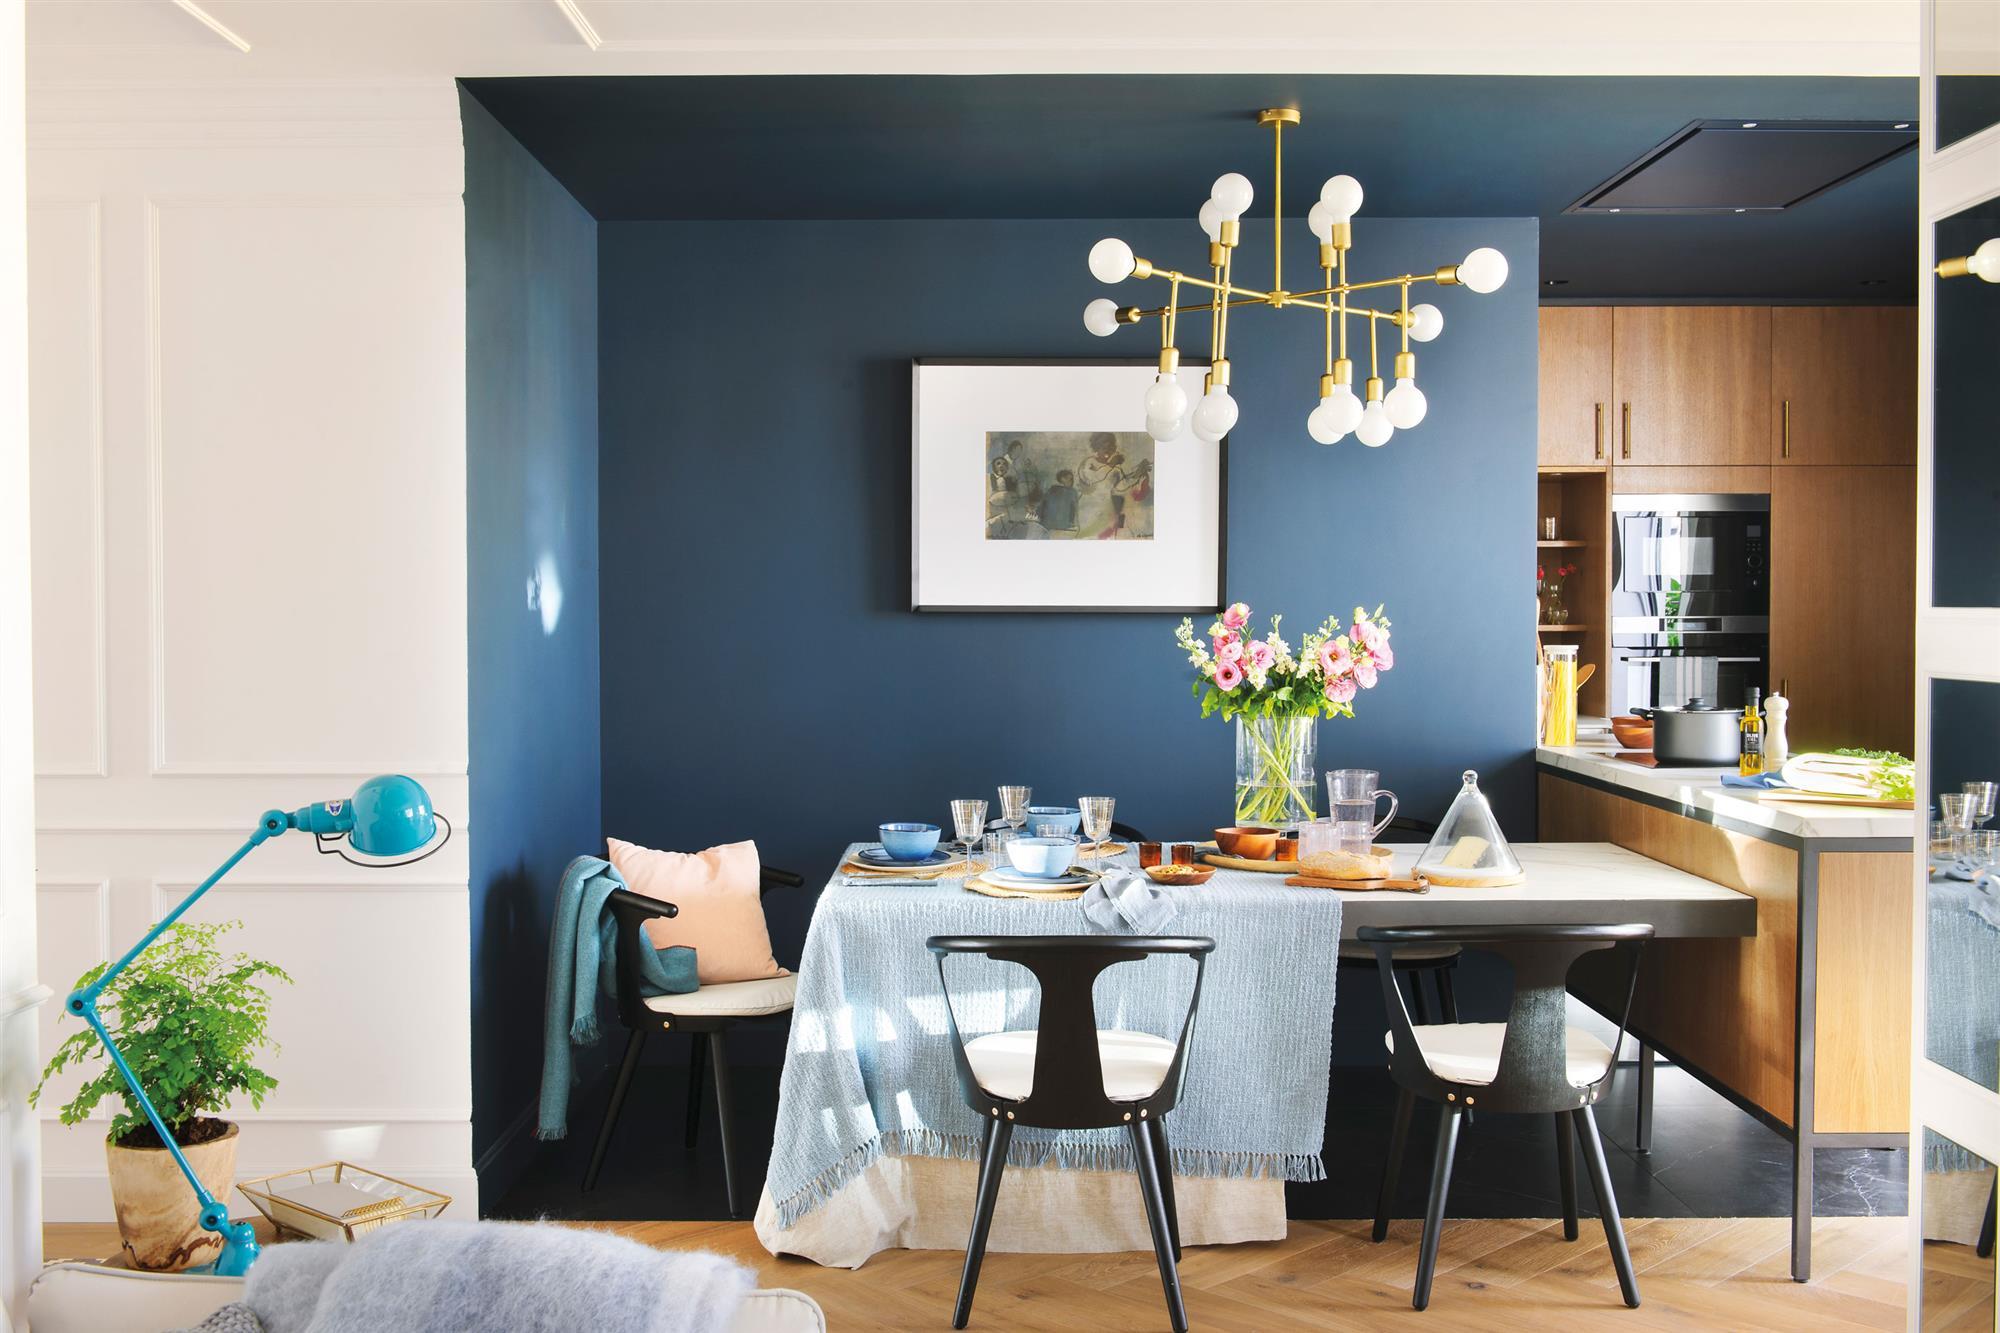 Tenemos la l mpara ideal para tu comedor for Alfombra azul turquesa del dormitorio